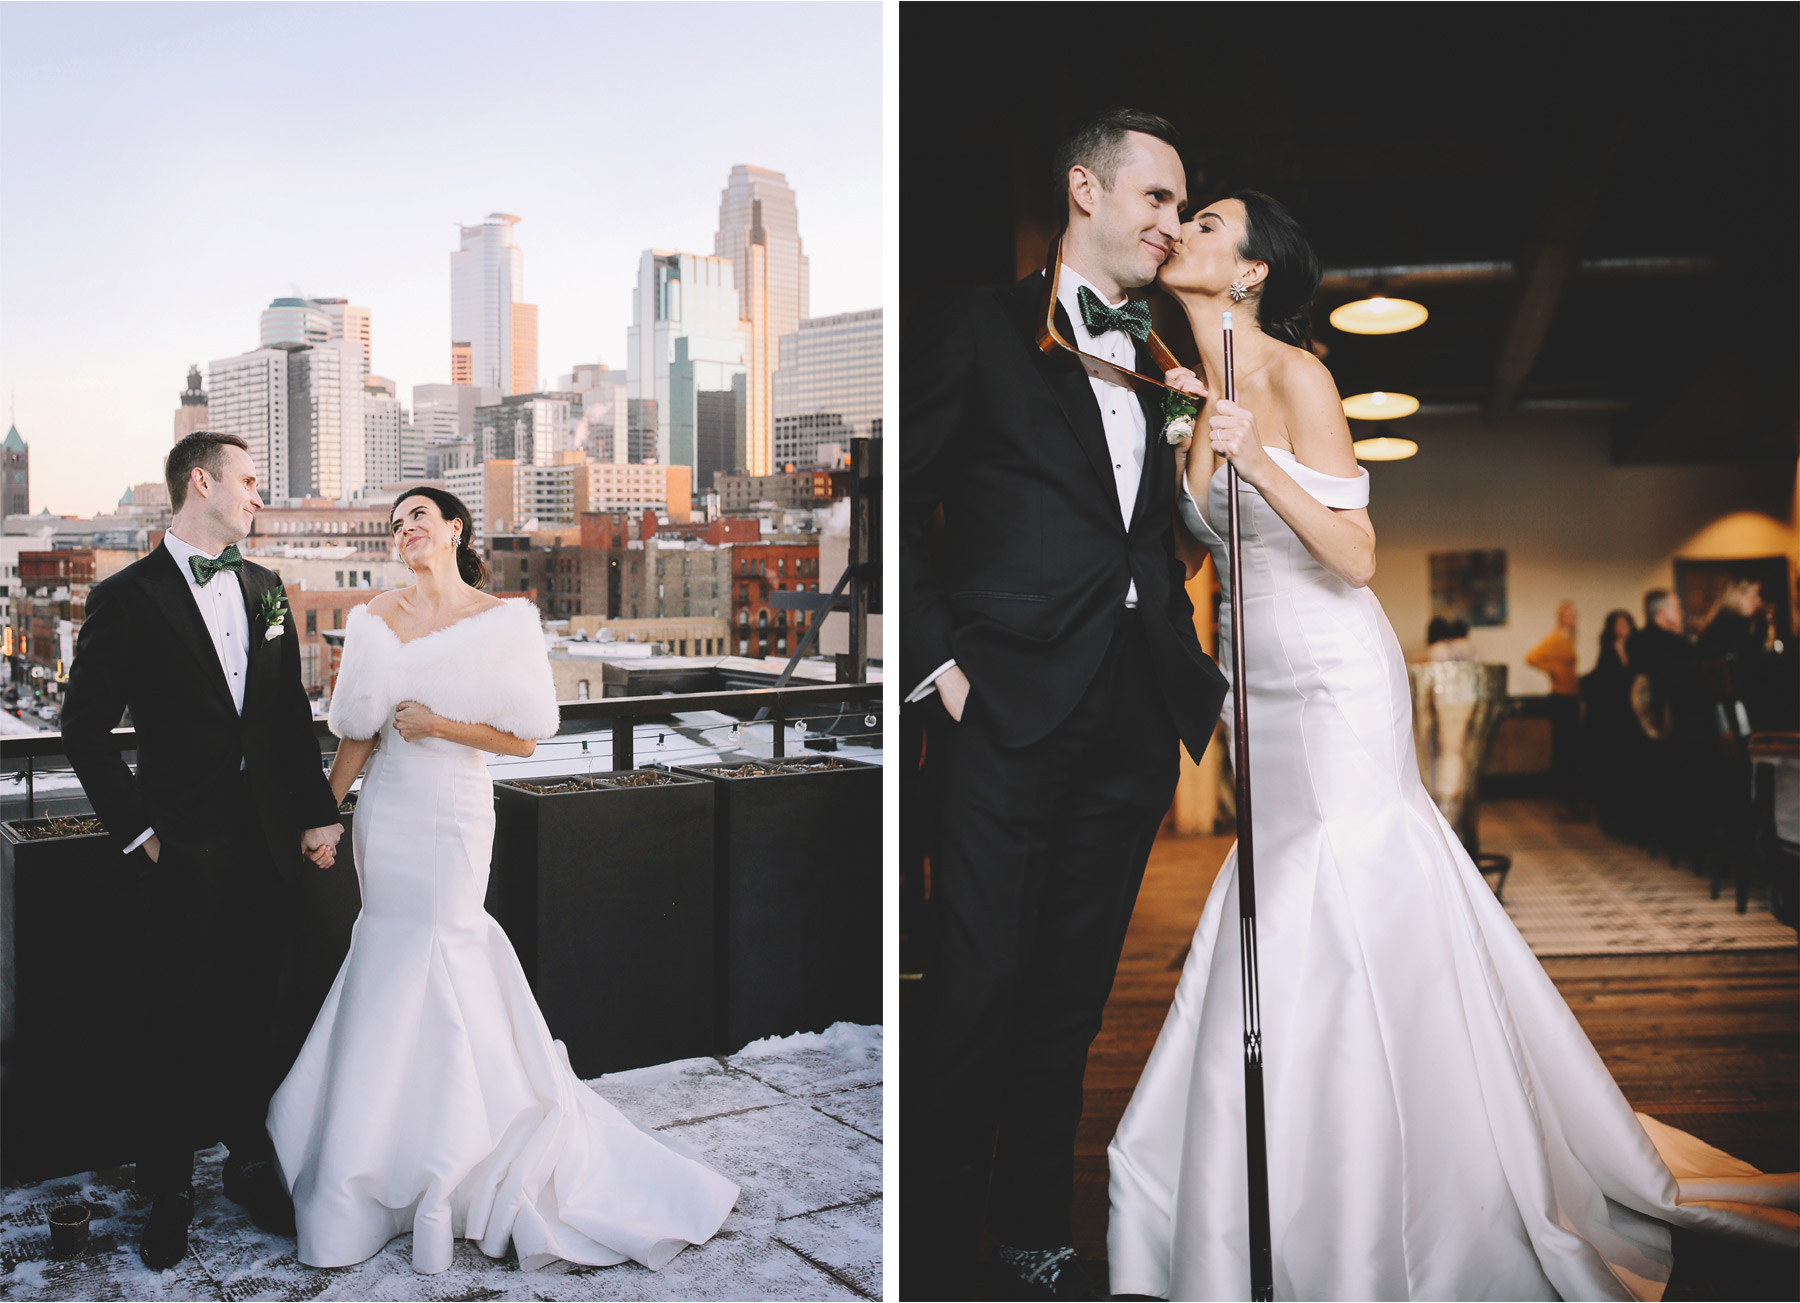 13-Minneapolis-Minnesota-Wedding-Photographer-Andrew-Vick-Photography-Winter-Bride-and-Groom-Downtown-Skyline-Pool-Triangle-Allison-and-Steve.jpg